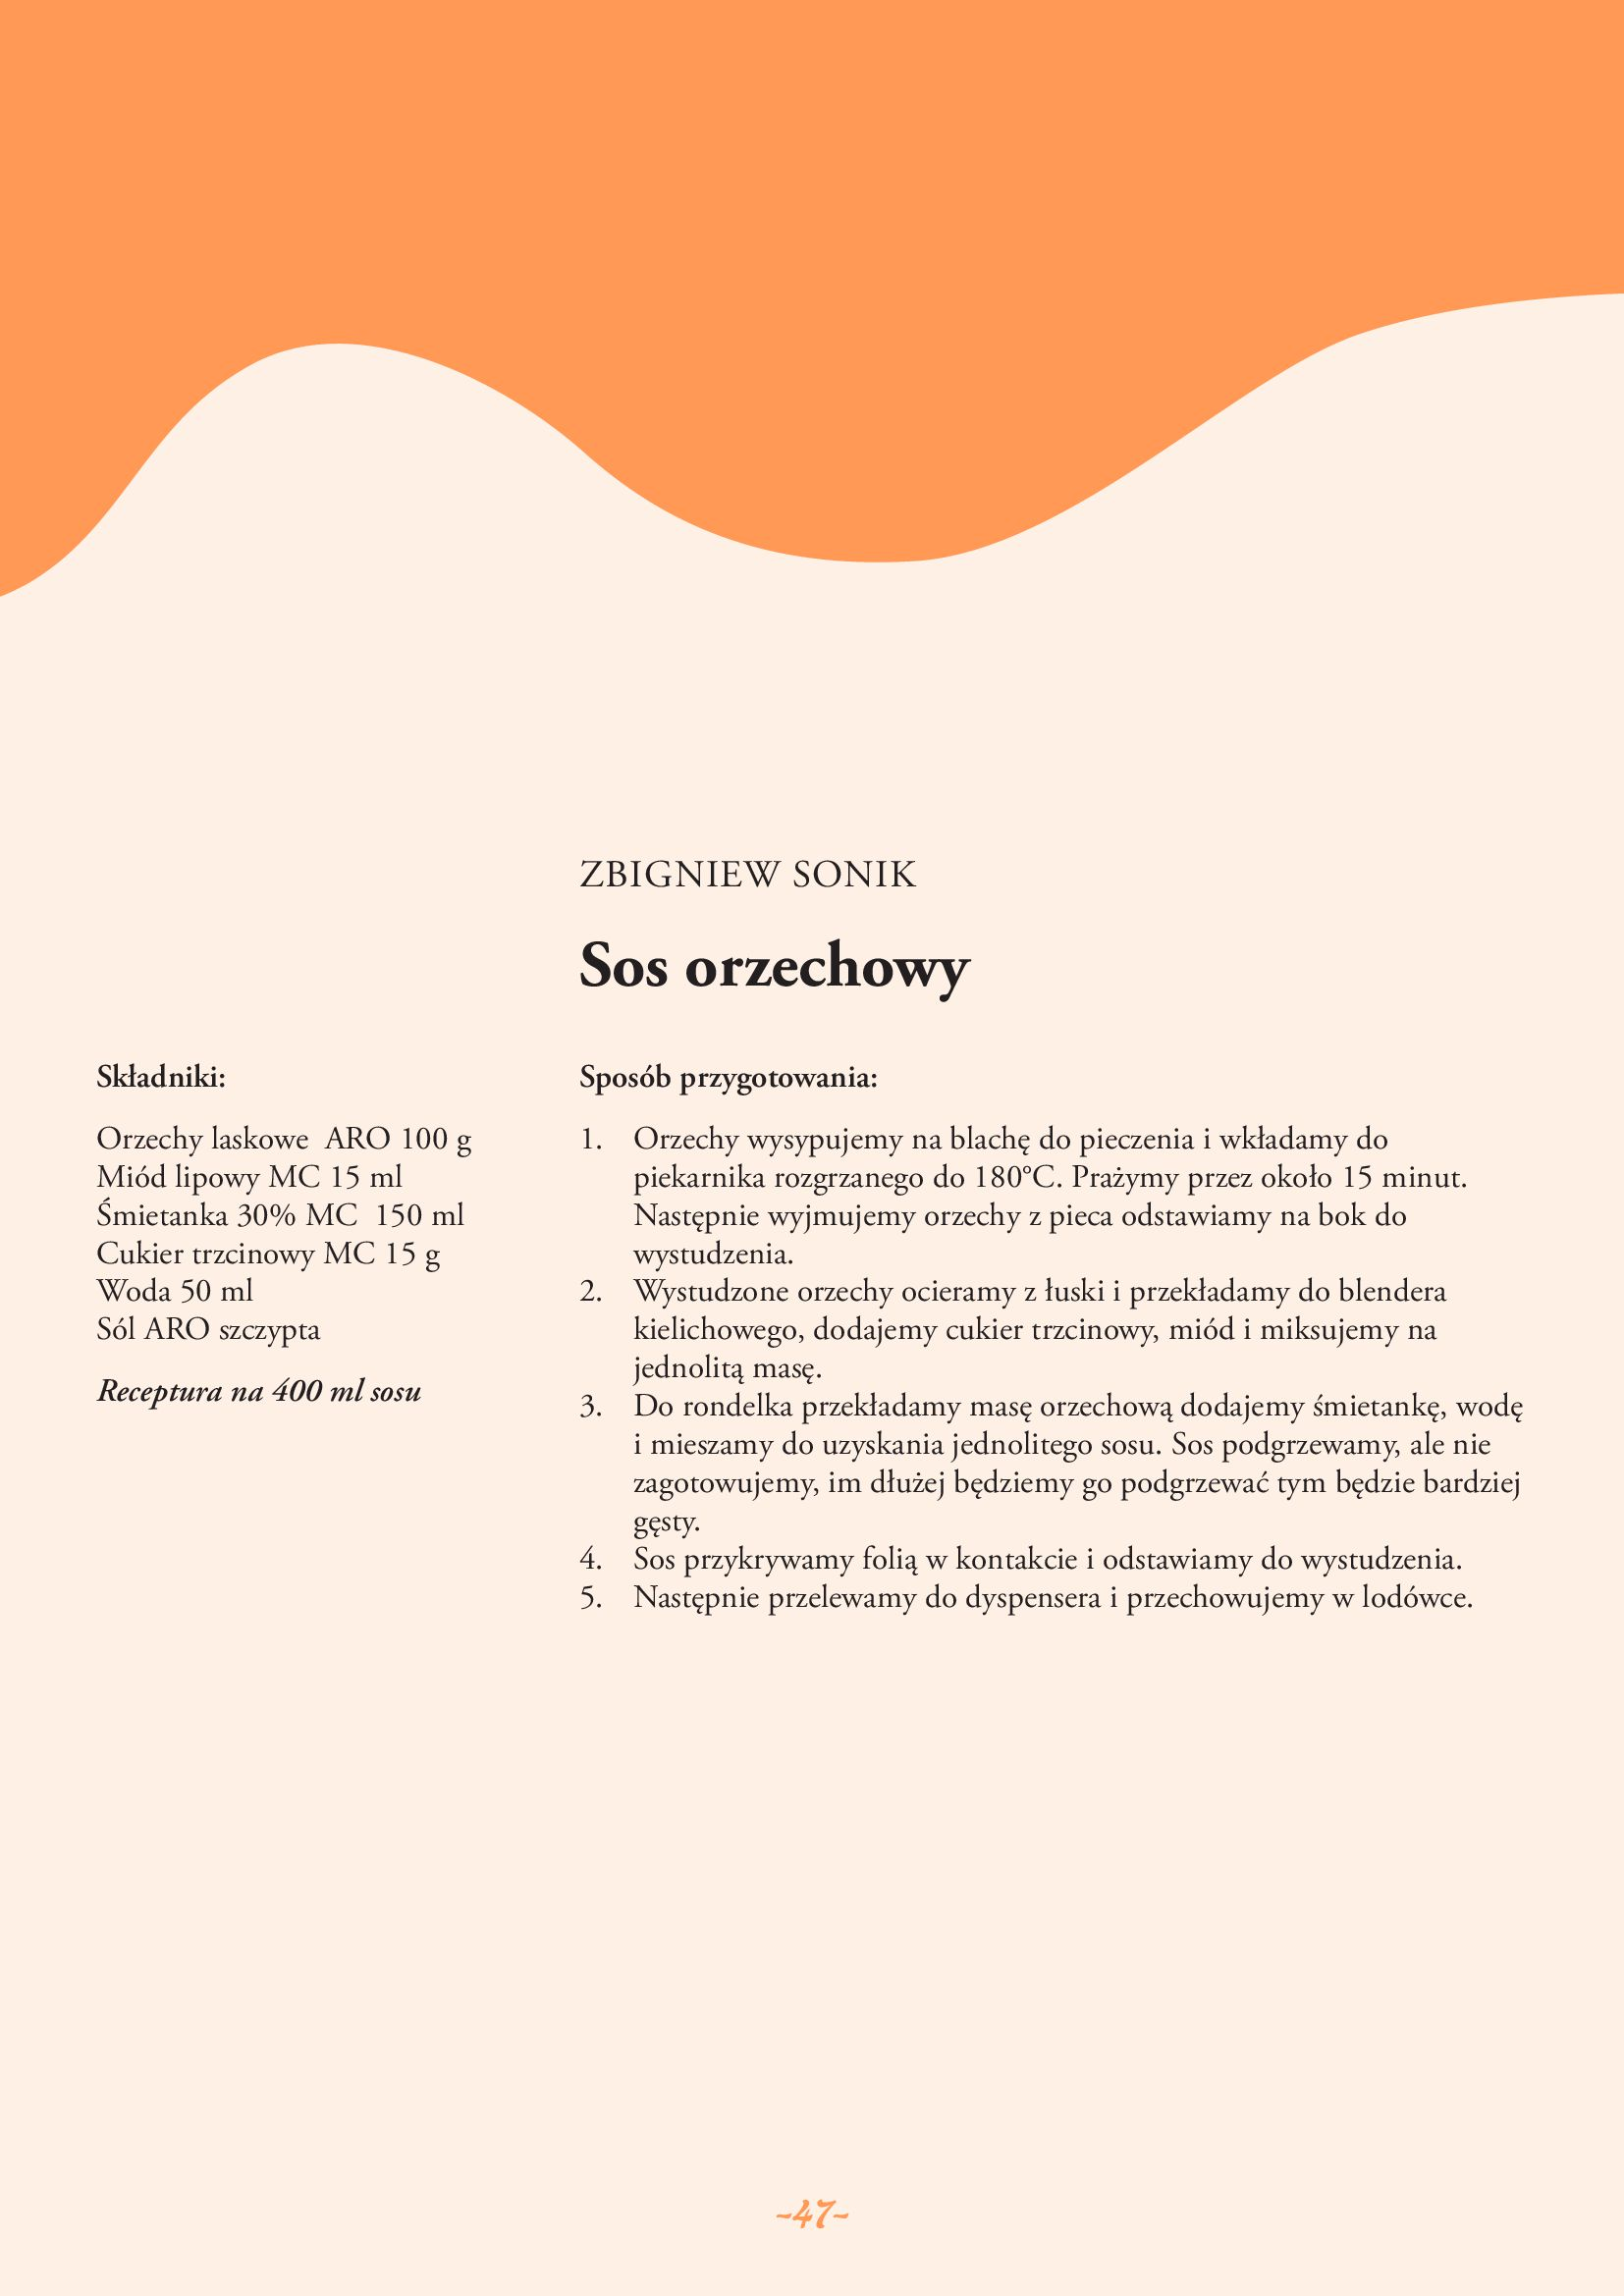 Gazetka Makro: Gazetka Makro - lody i desery 2021-05-21 page-47